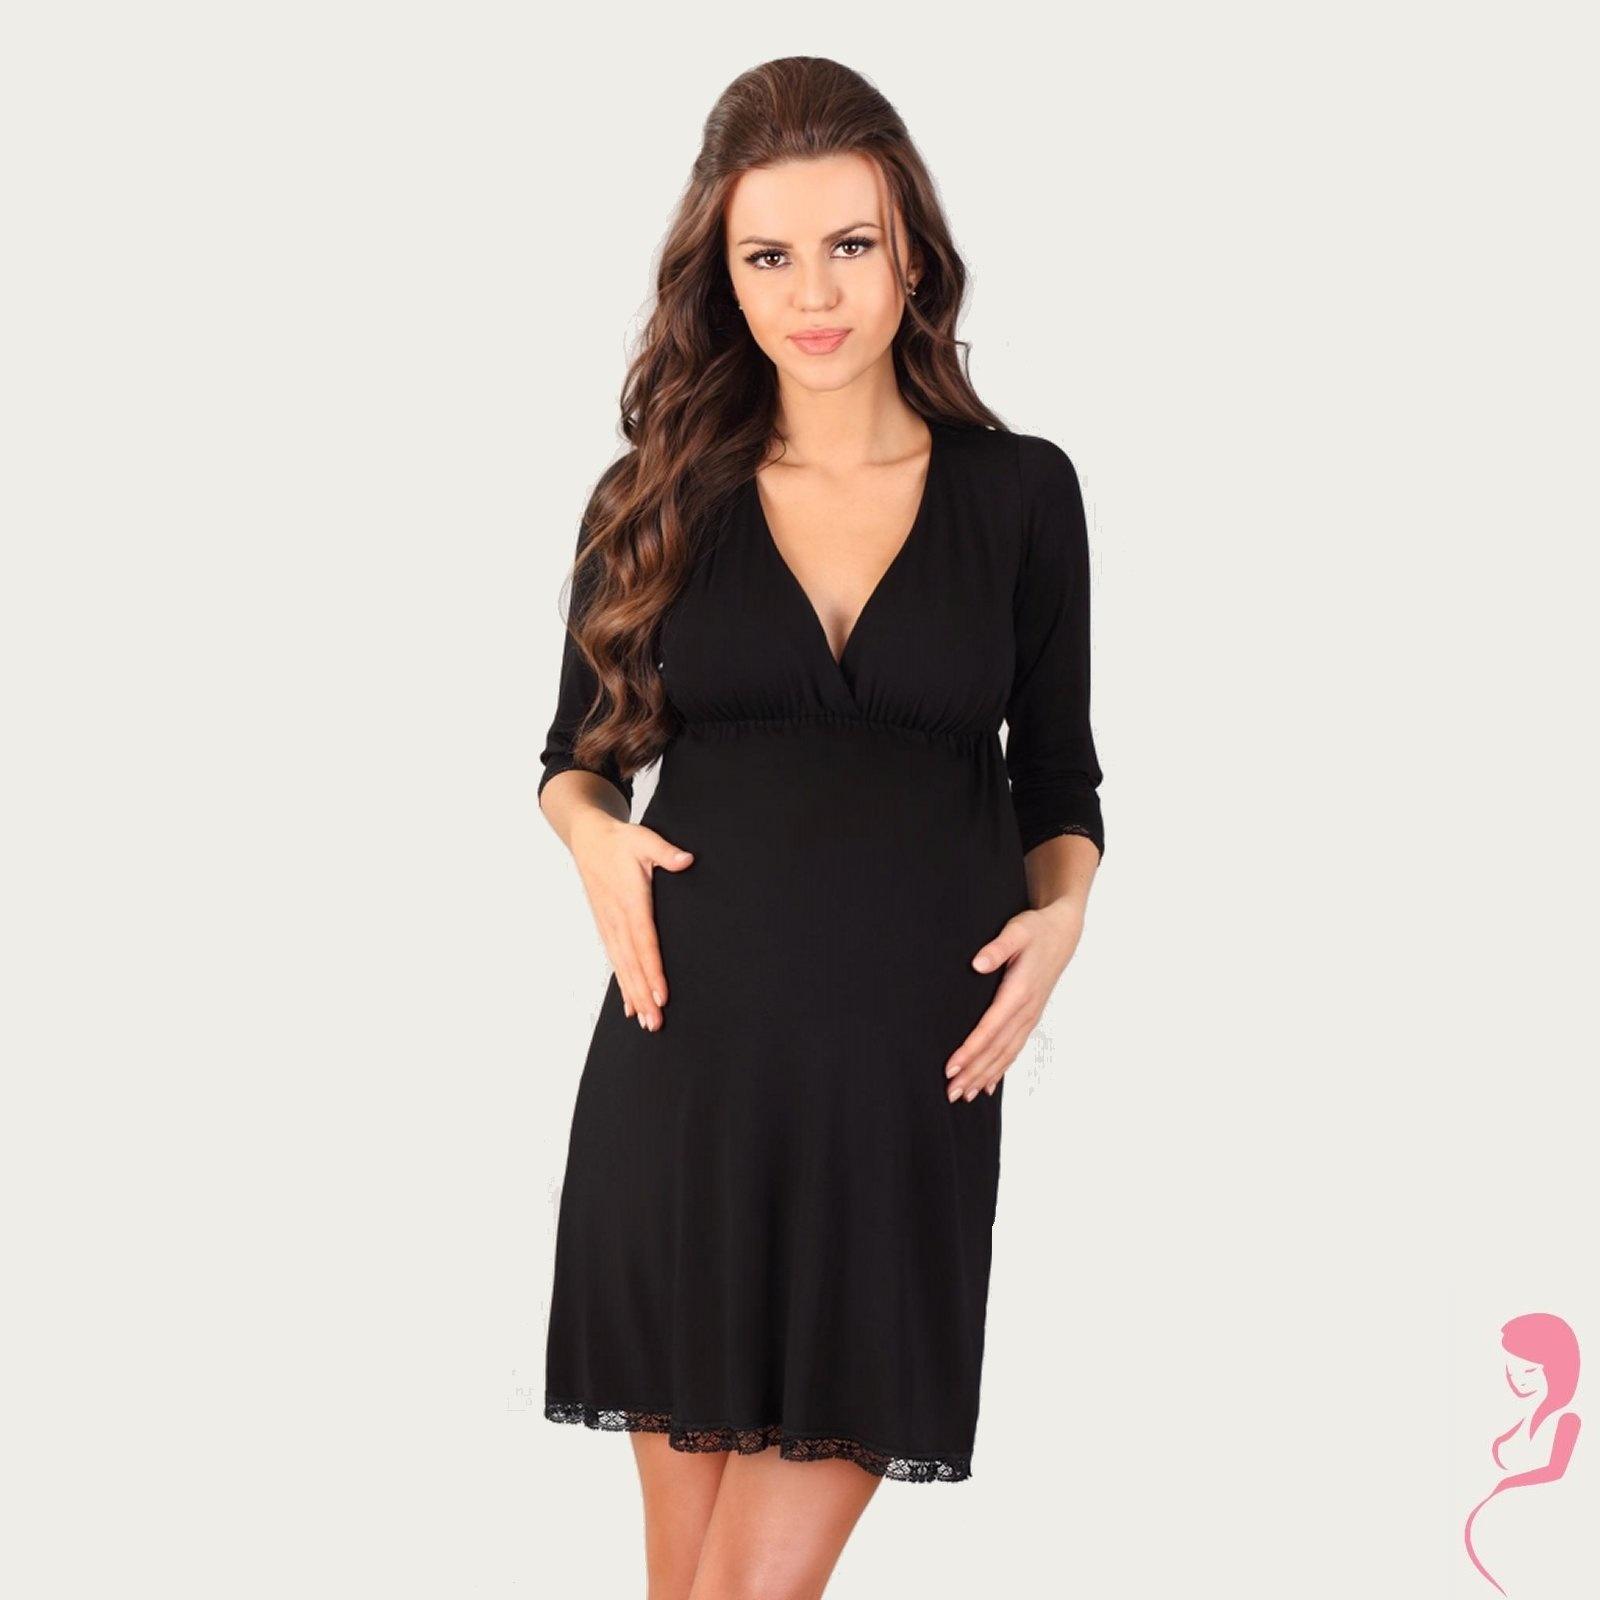 Lupoline Zwangerschapsjurk - Voedingsjurk Black 3/4 mouw